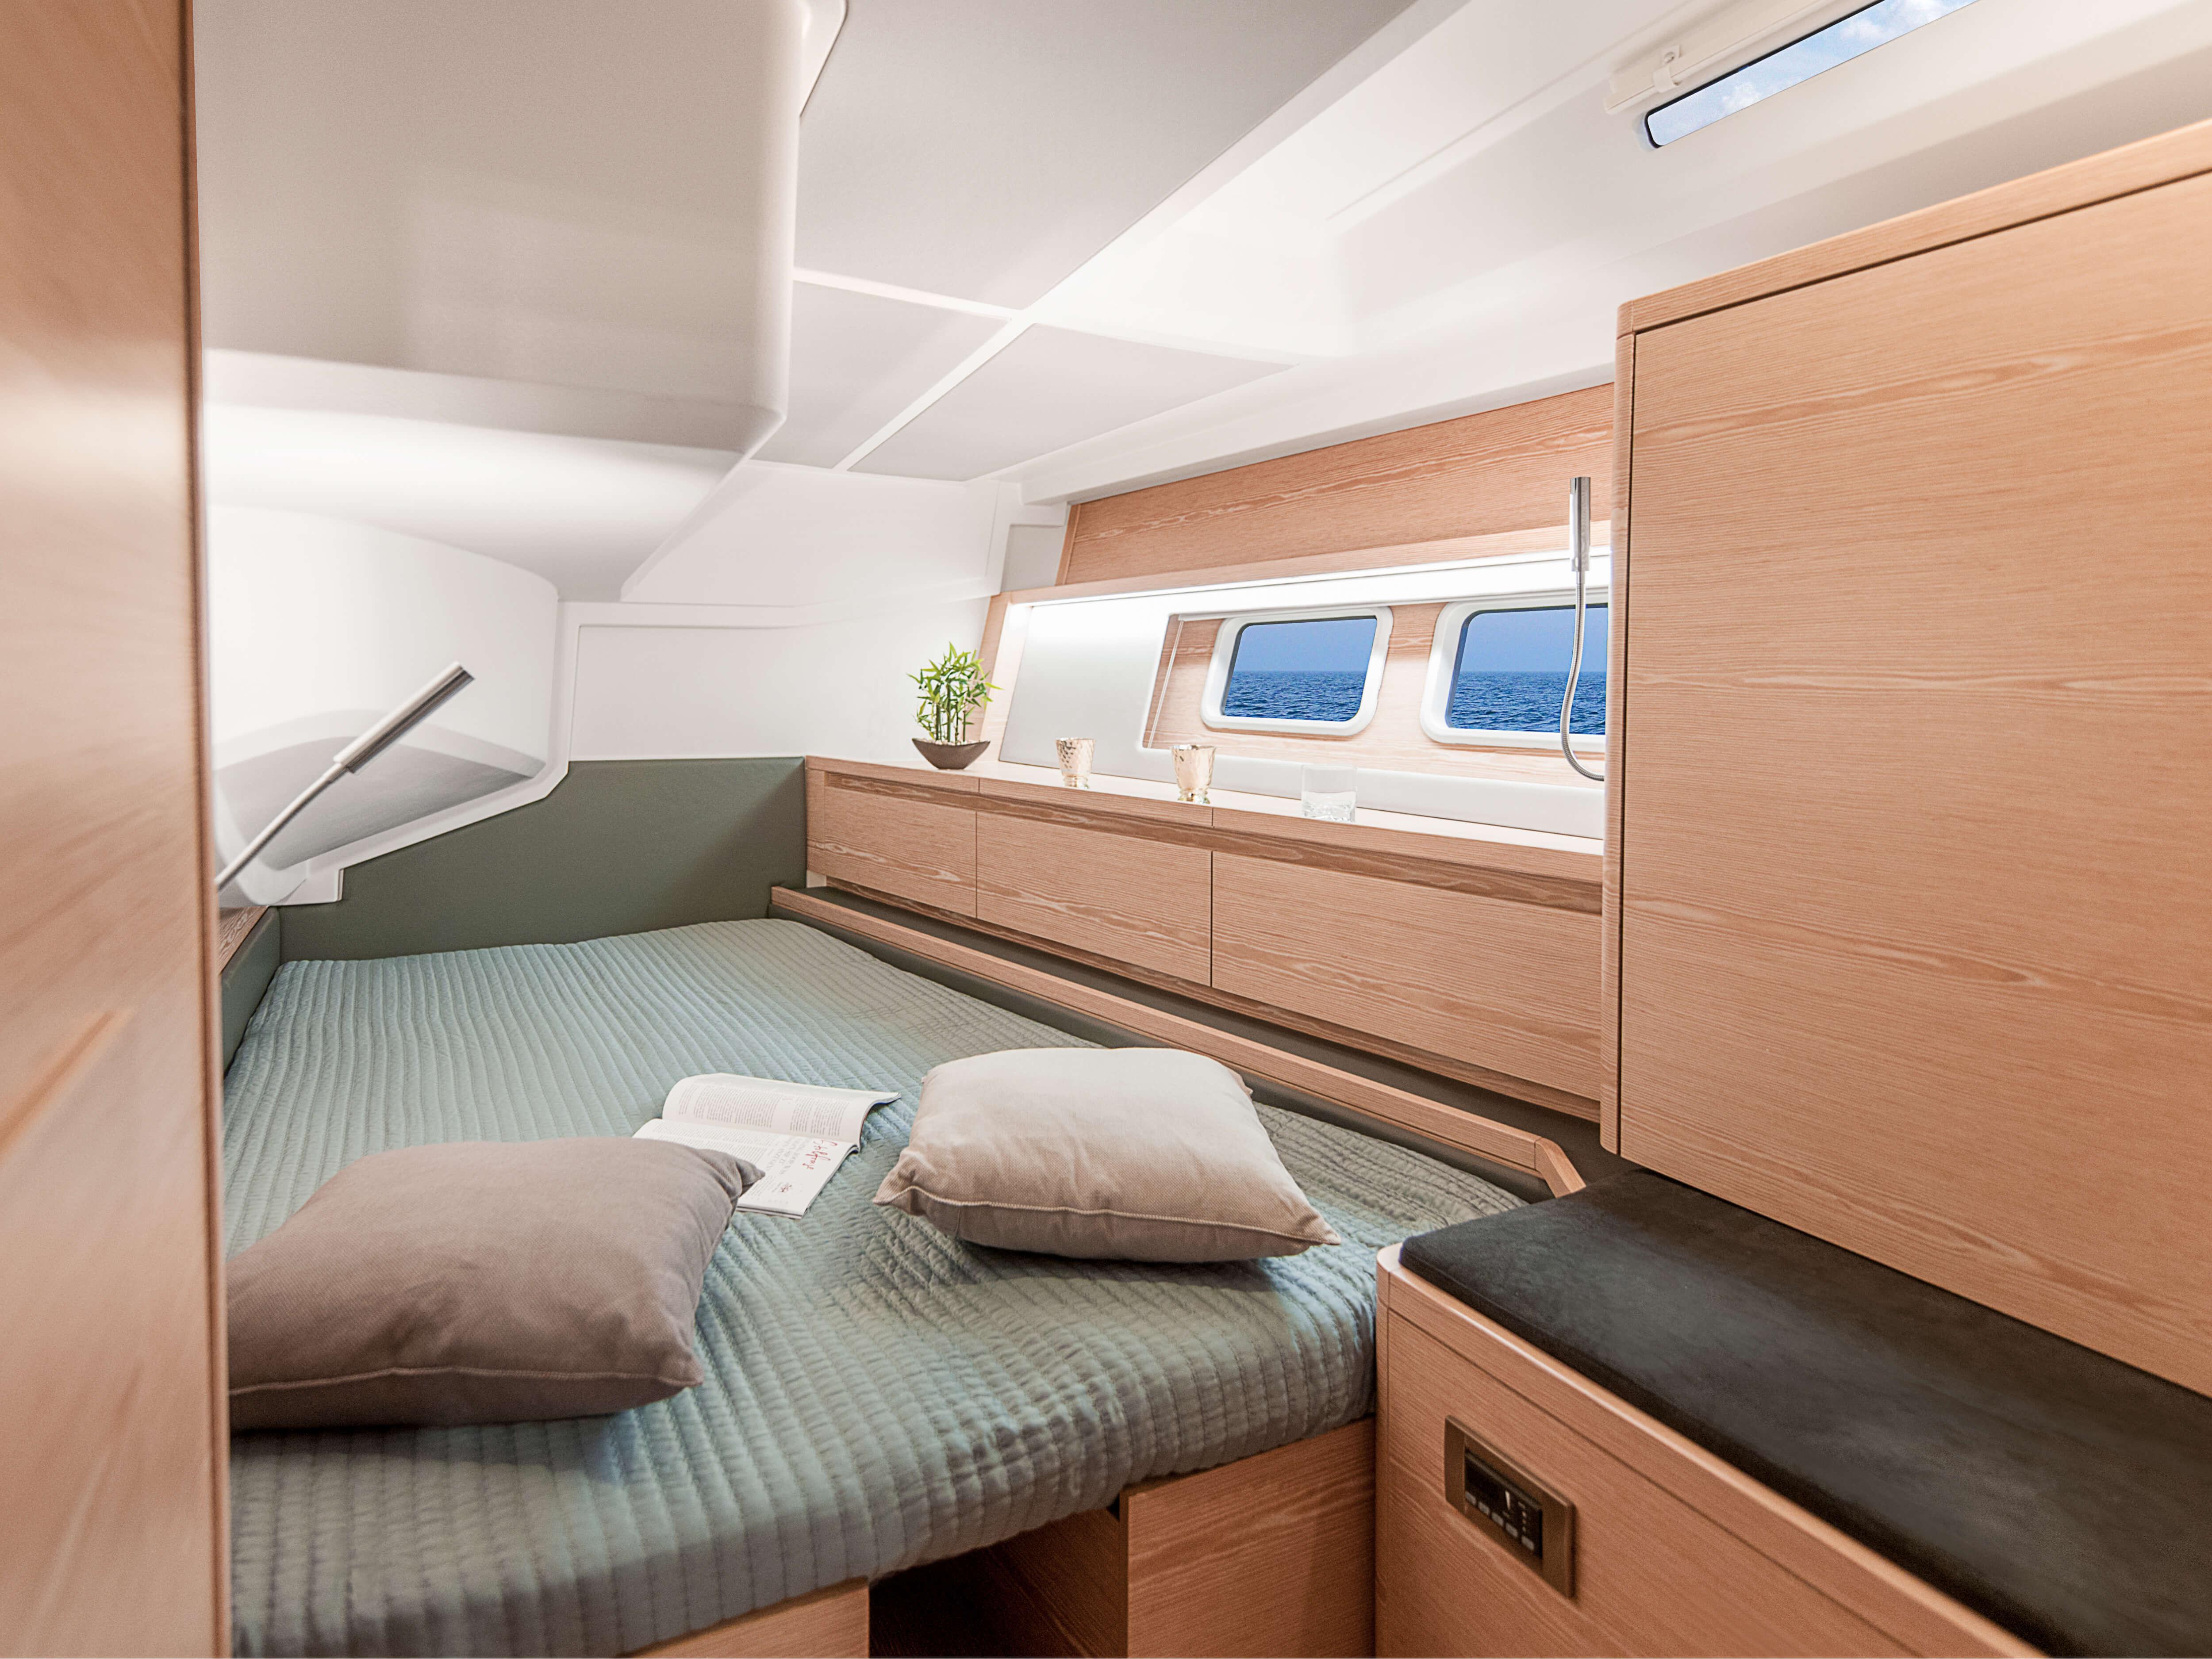 Hanse 588 | double berth, storage compartments | Hanse